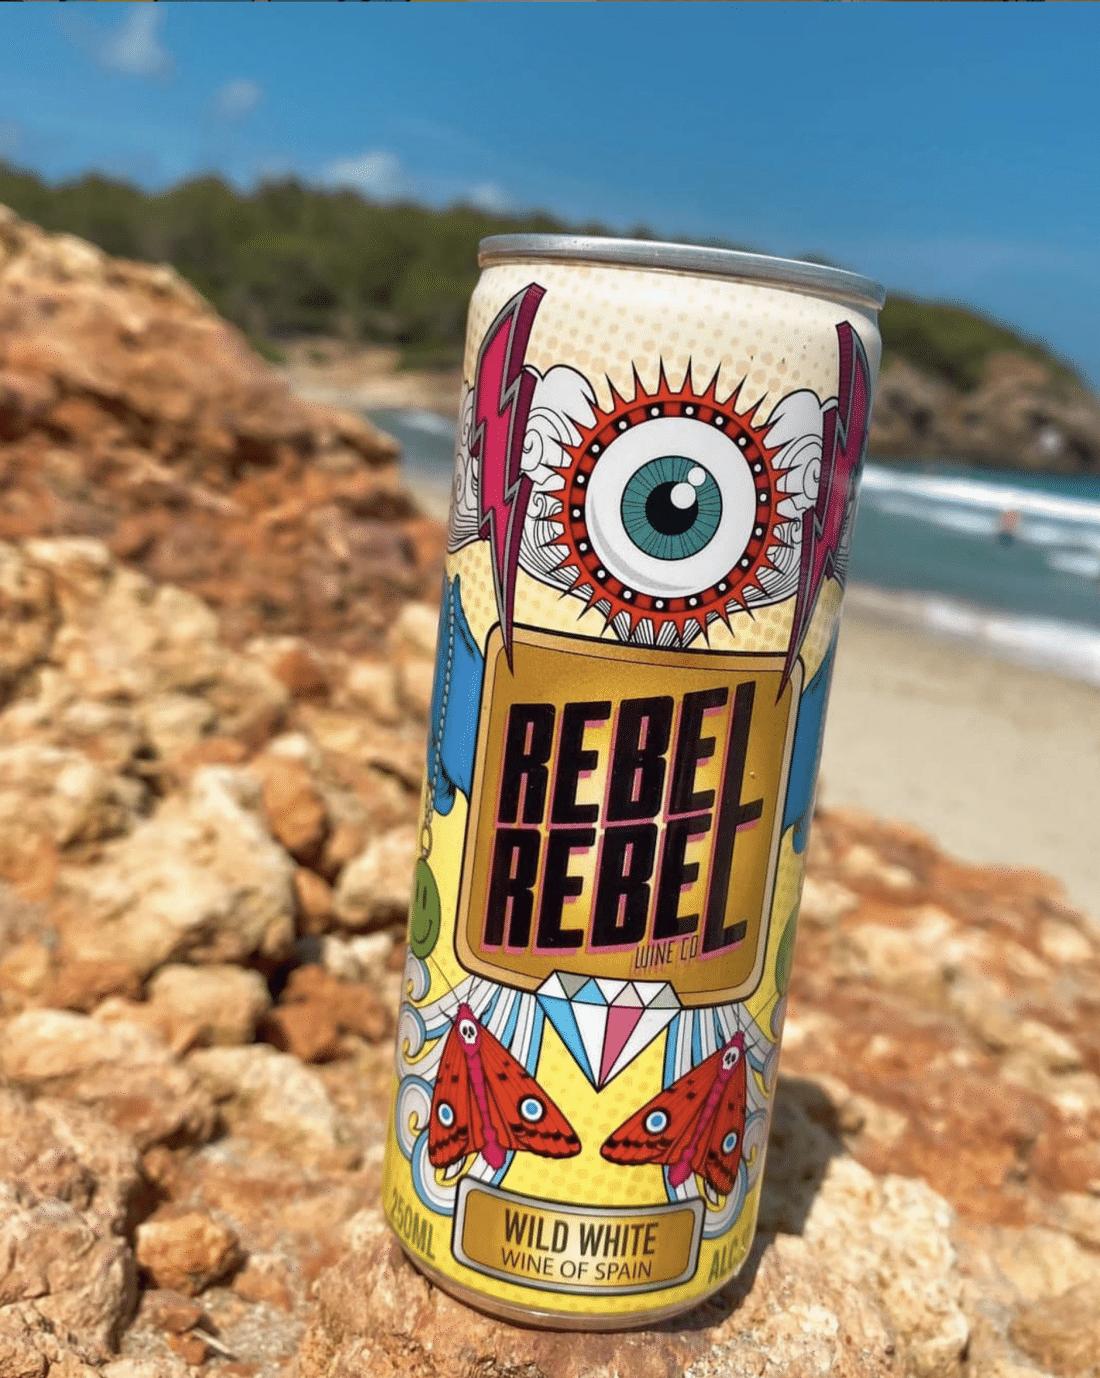 Wilde White Rebel Rebel Wine Co.